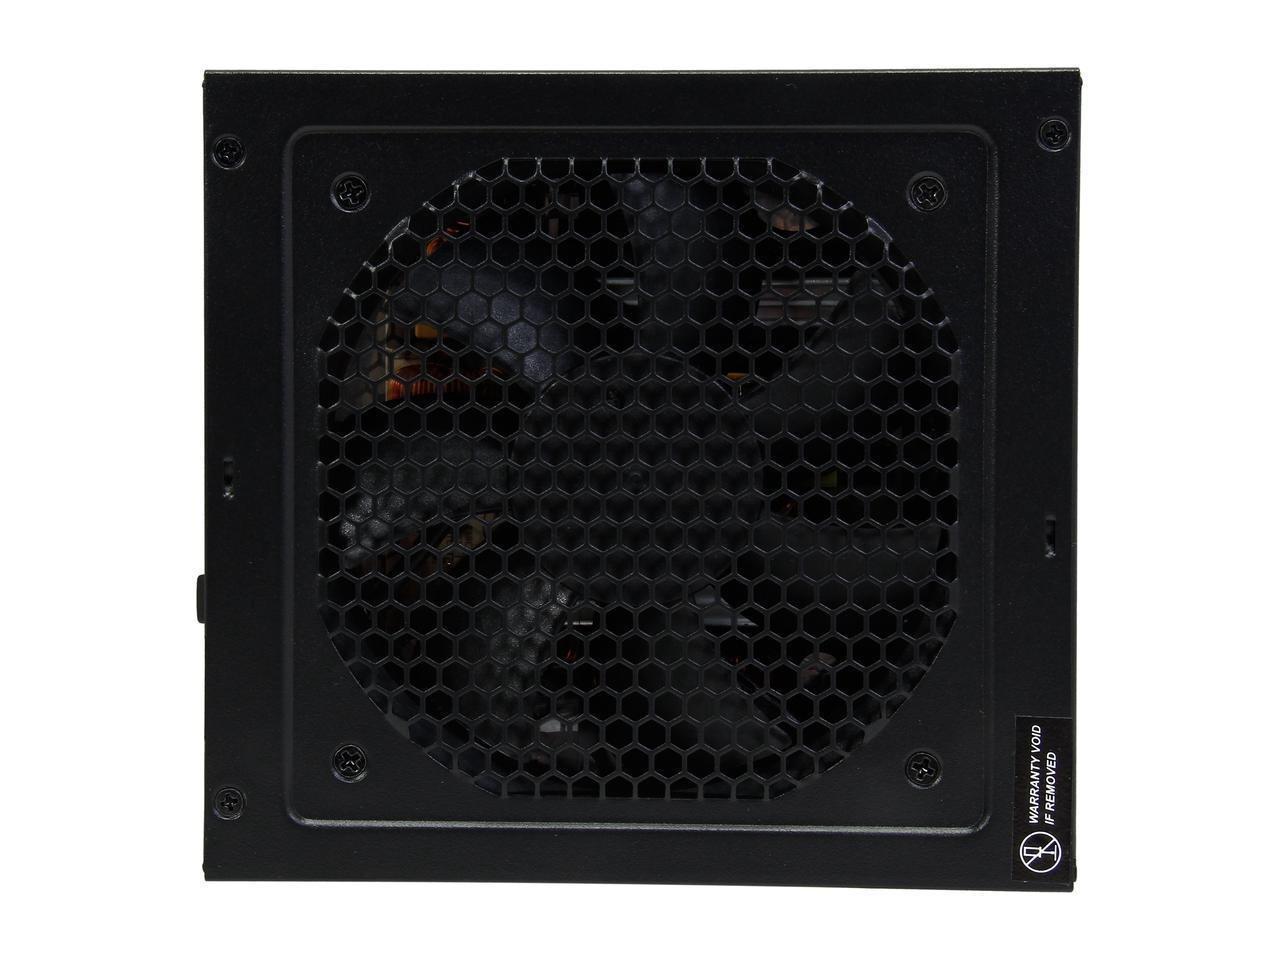 Seasonic M12II EVO 620 SS-620GM2 620W 80+ Bronze EVO Edition ATX12V & EPS12V Full Modular 105 °C Japanese Capacitor 5 Year Warranty Power Supply by Seasonic (Image #3)